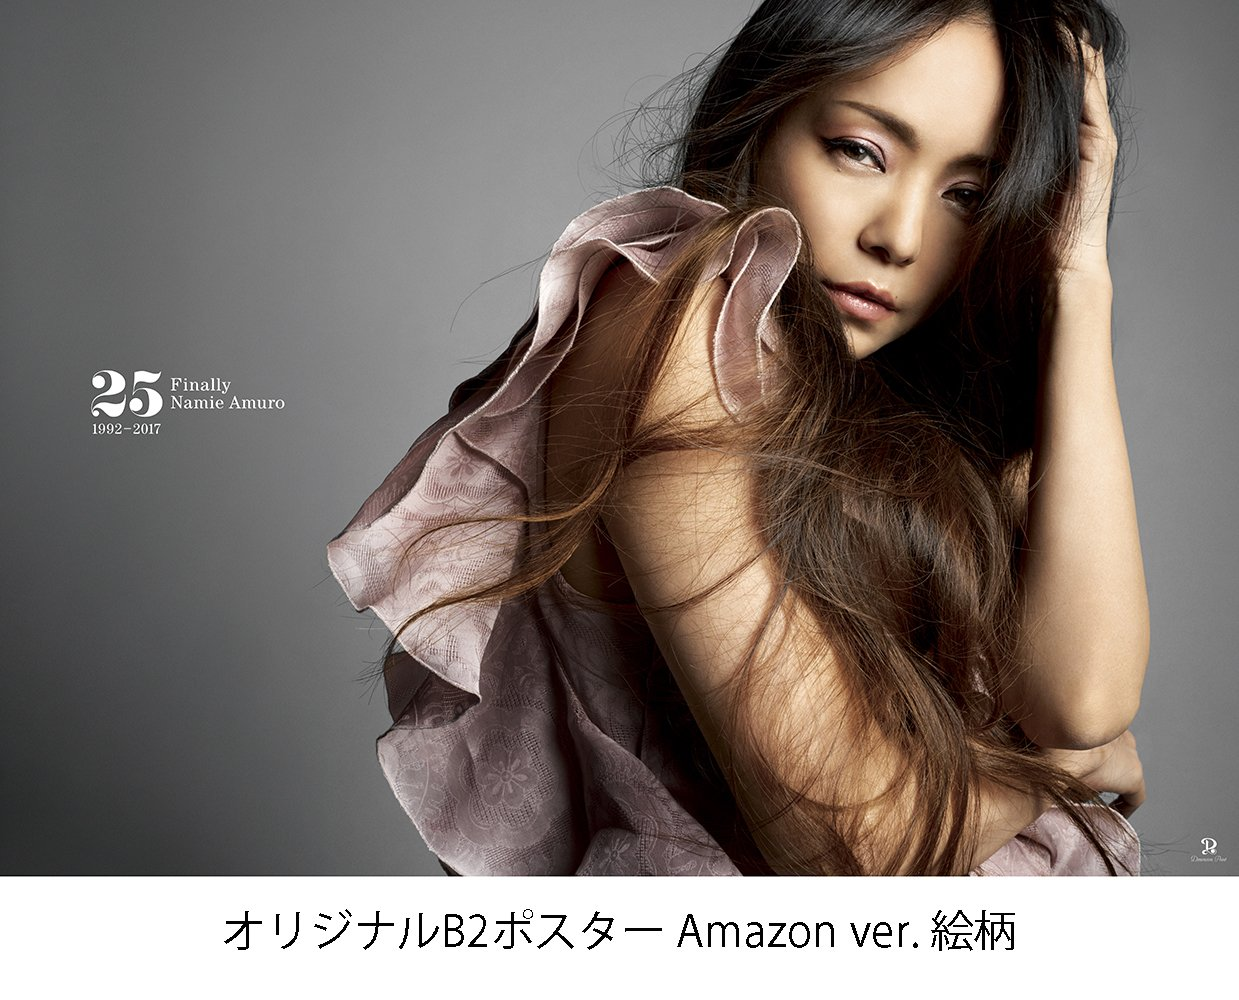 Finally(Blu-ray Disc付) 安室奈美恵